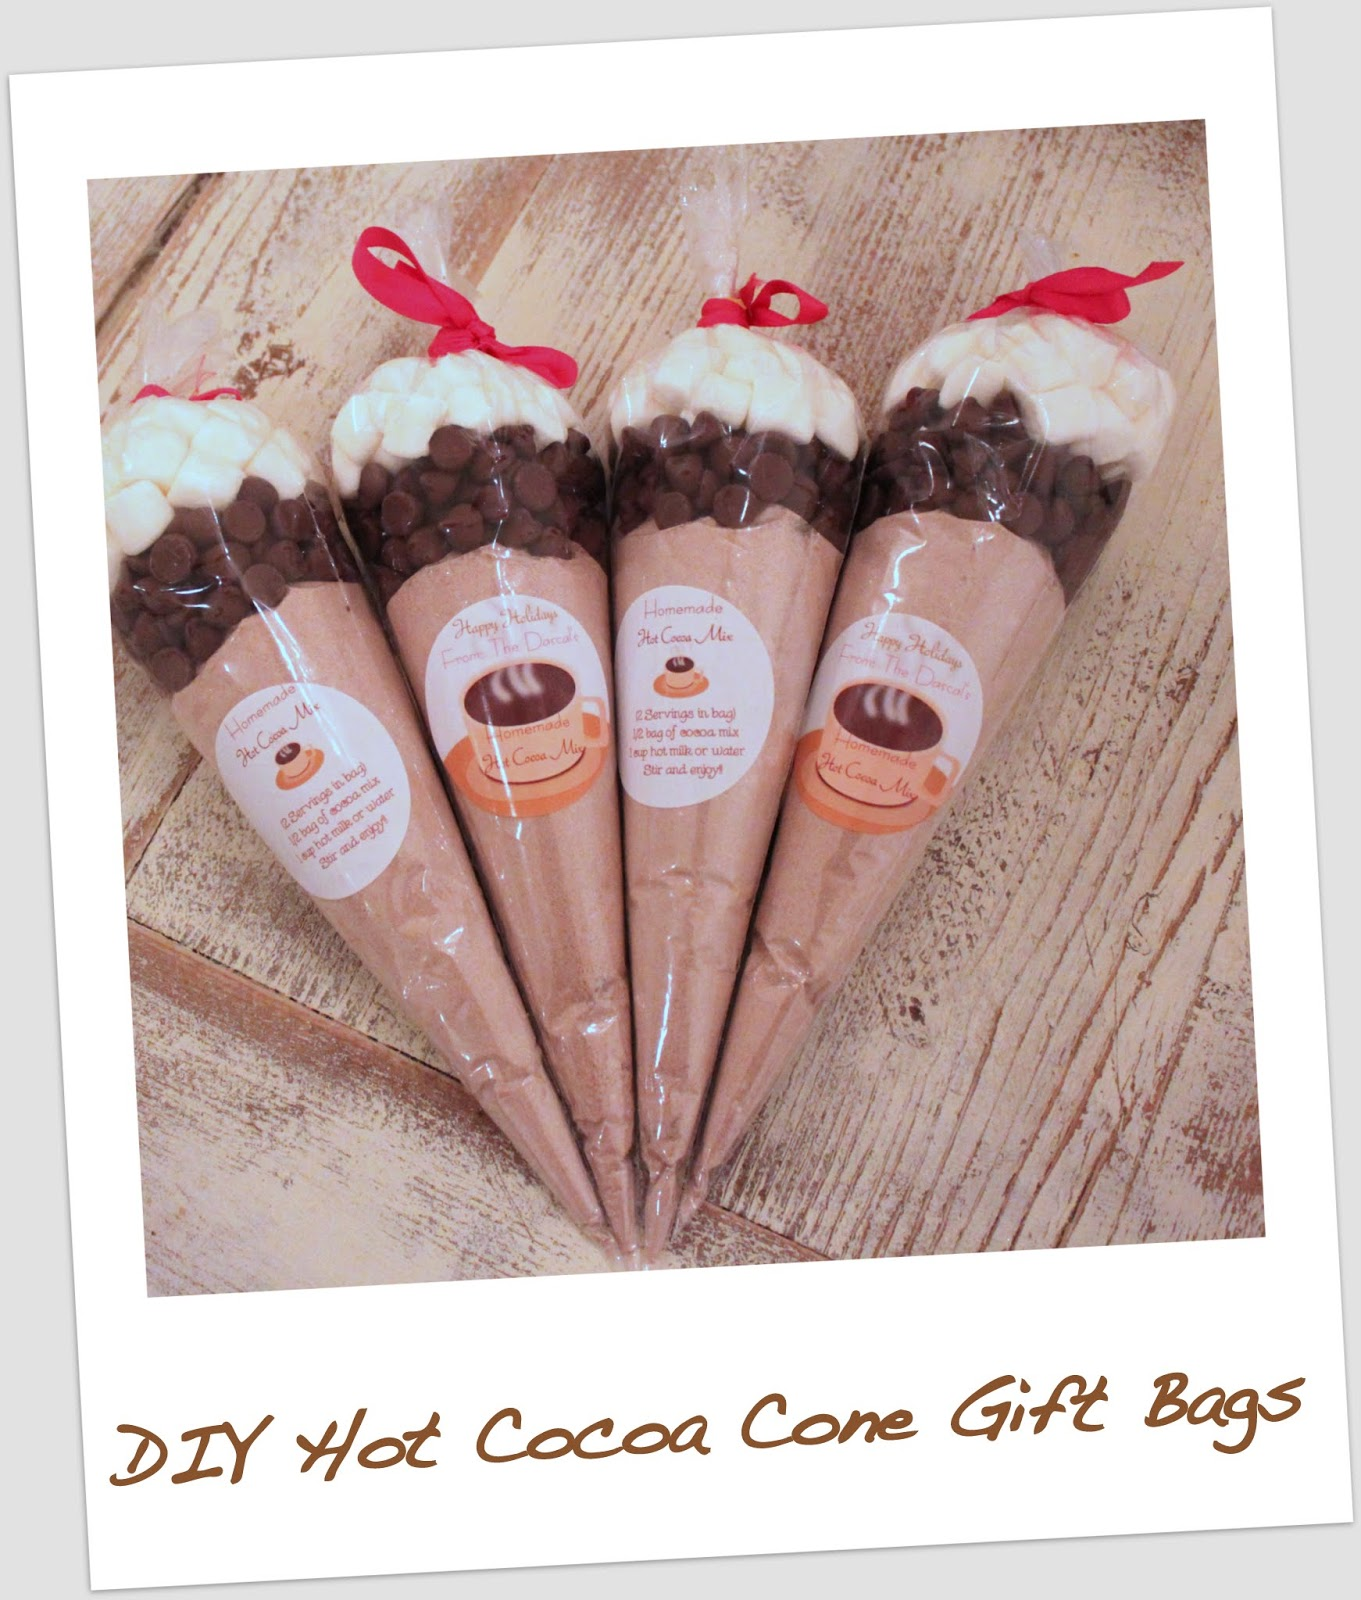 Hot Chocolate Mix Gift Bag